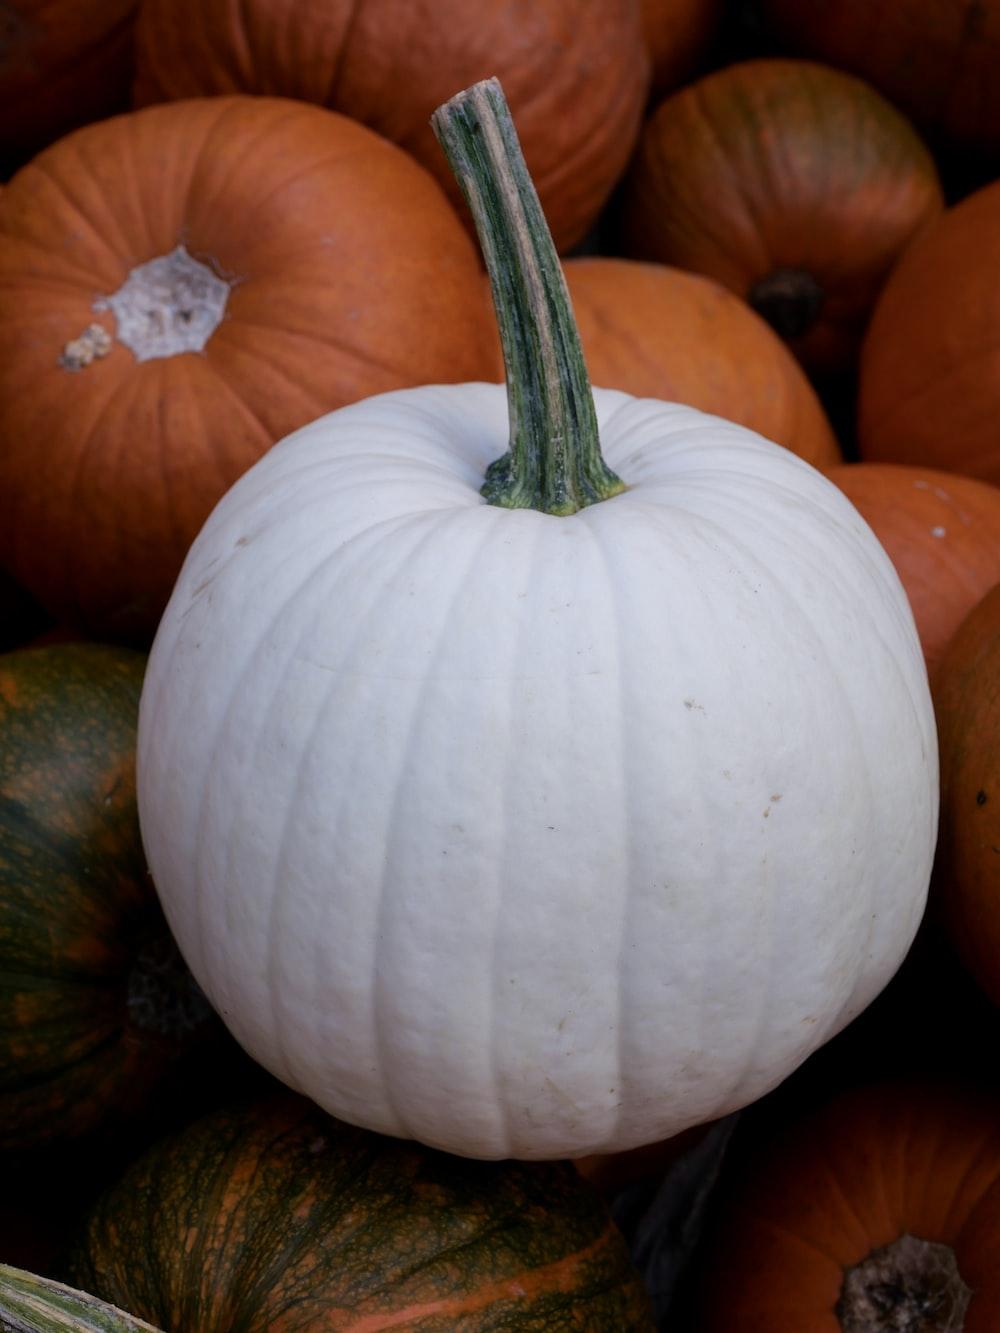 white pumpkin on top of orange pumpkins photo – Free Plant Image on Unsplash